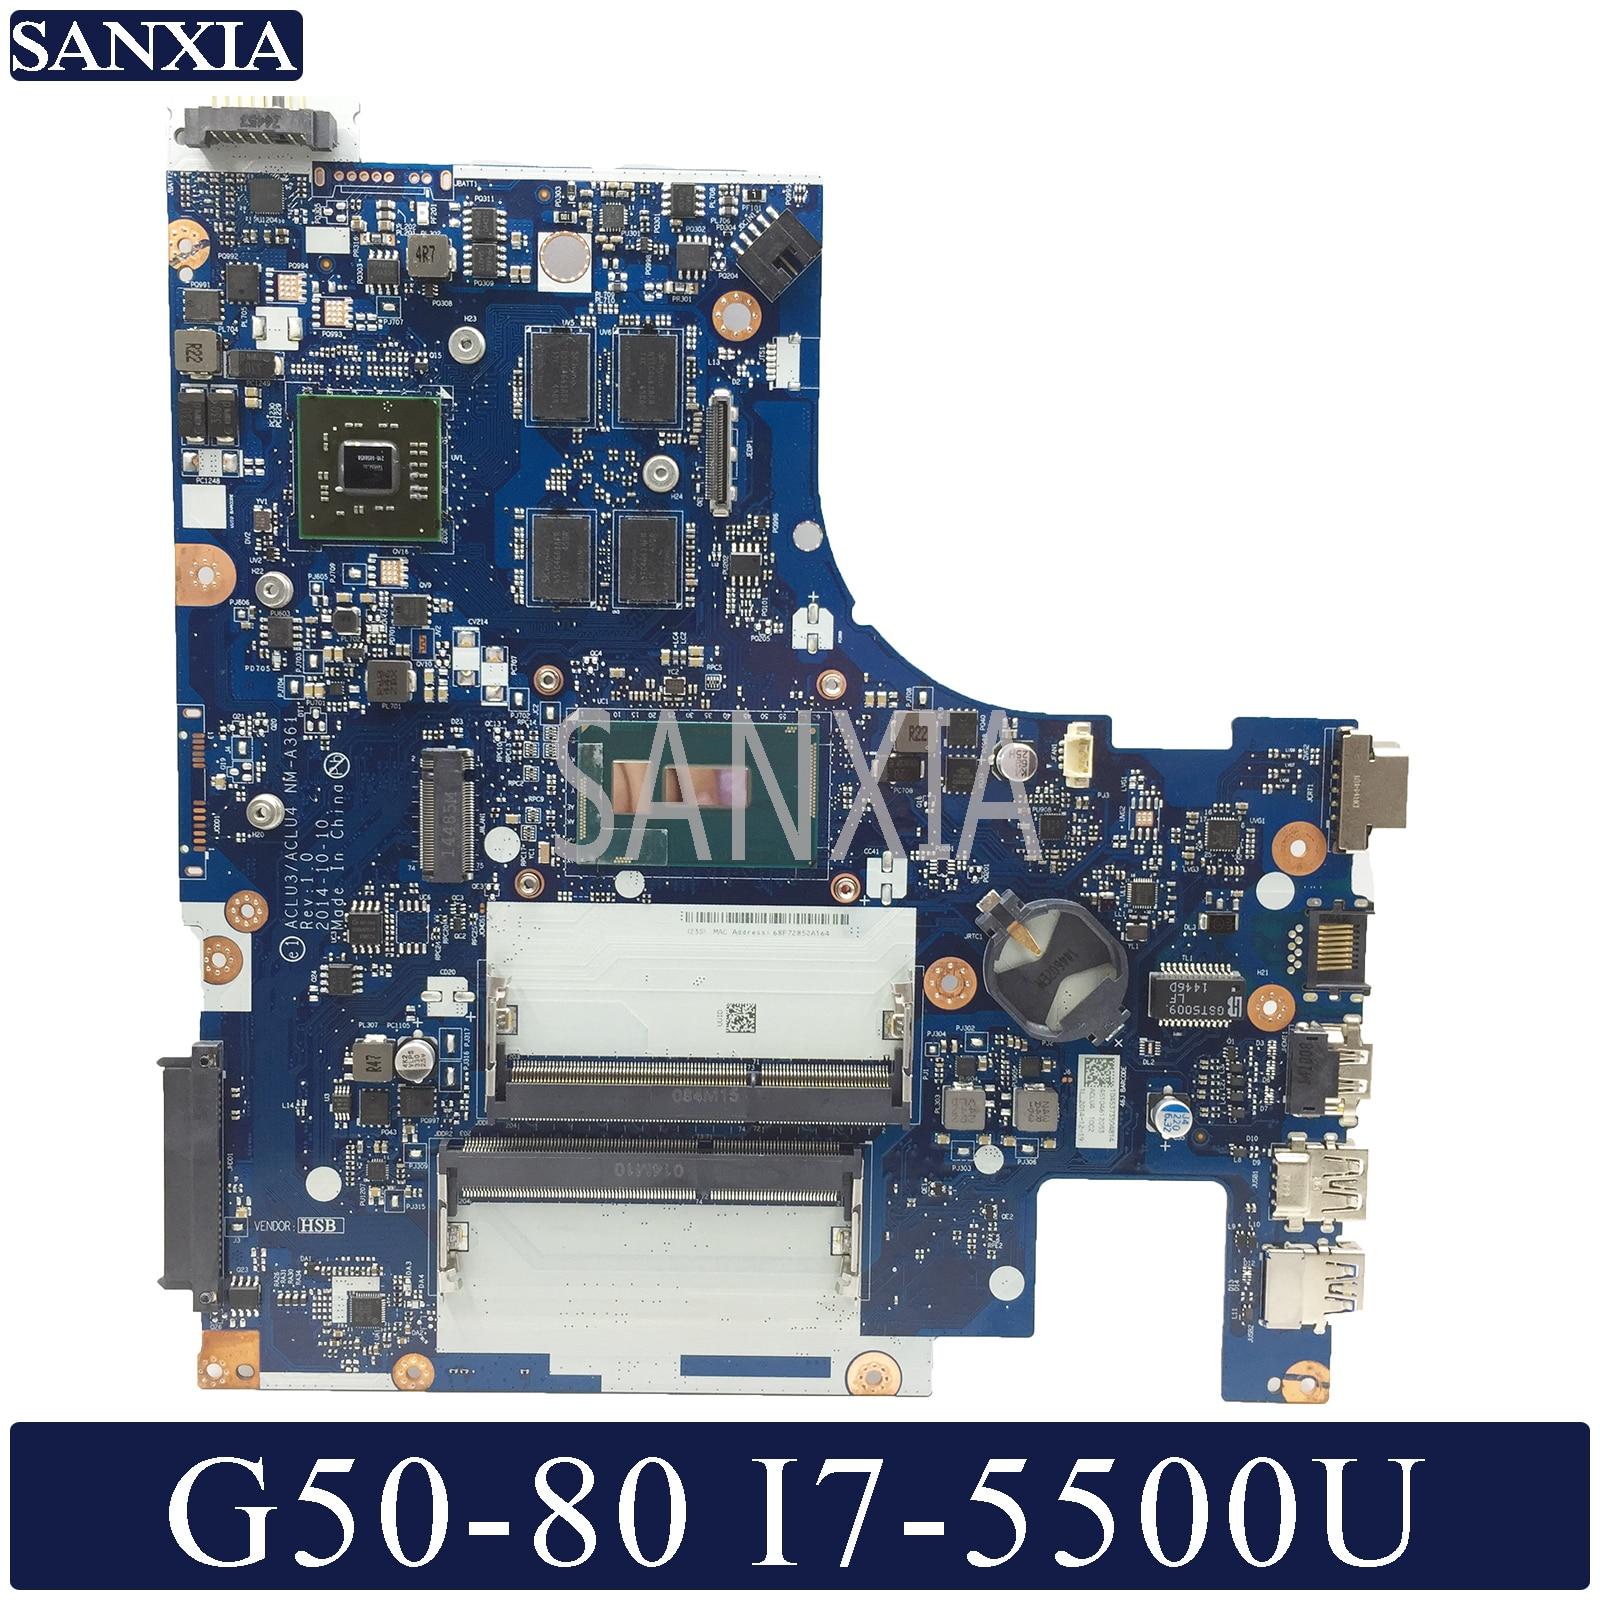 KEFU NM-A361 Laptop Motherboard For Lenovo G50-80 Original Mainboard I7-5500U R5-Video